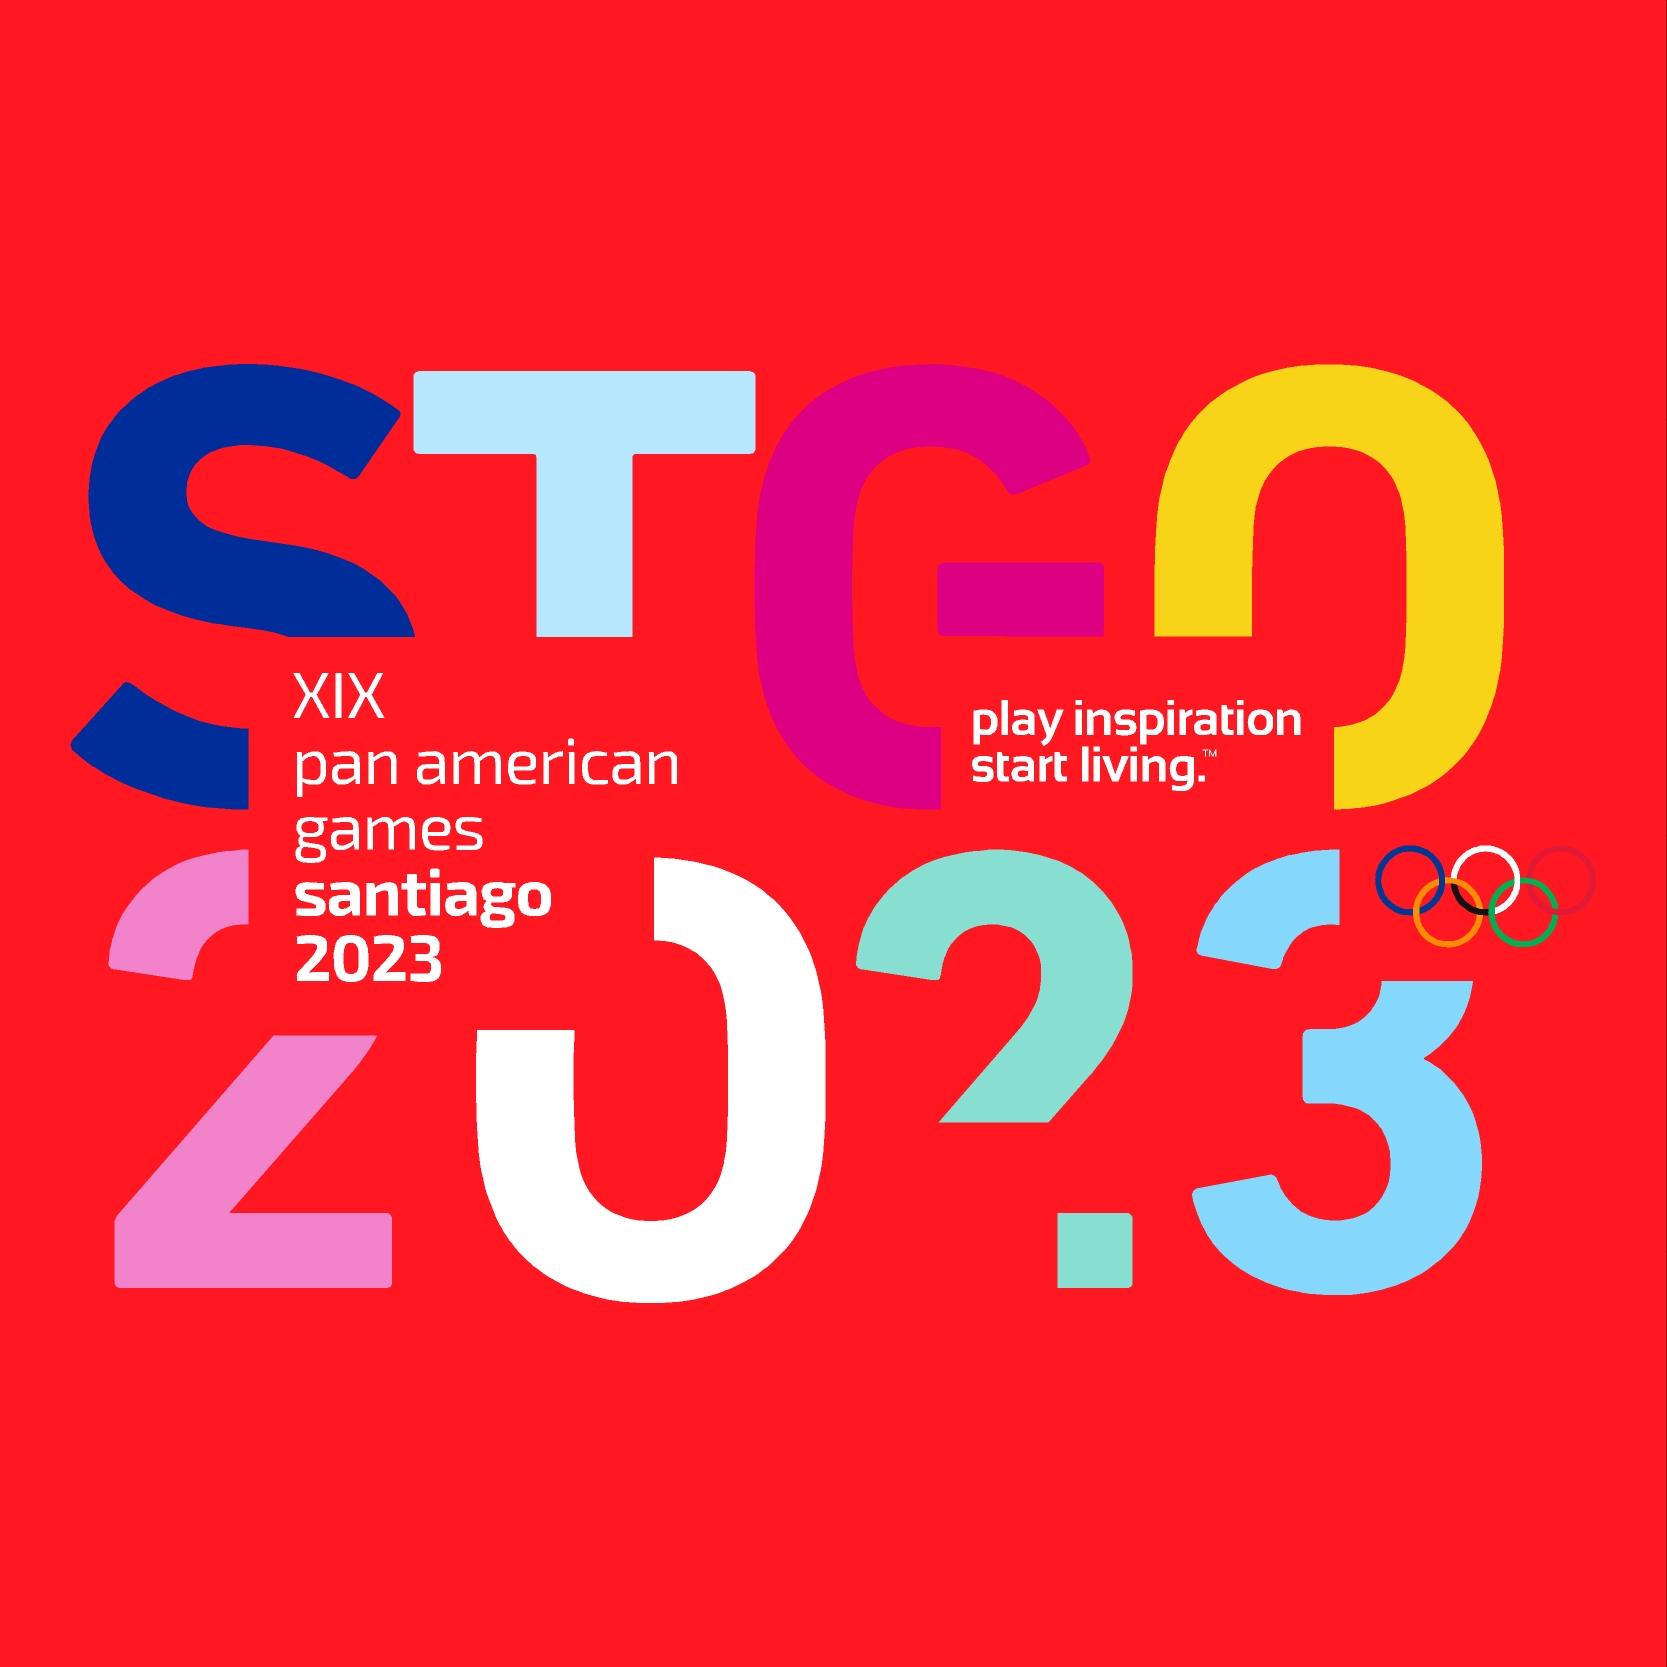 Branding 2023 PANAM SCL9891R